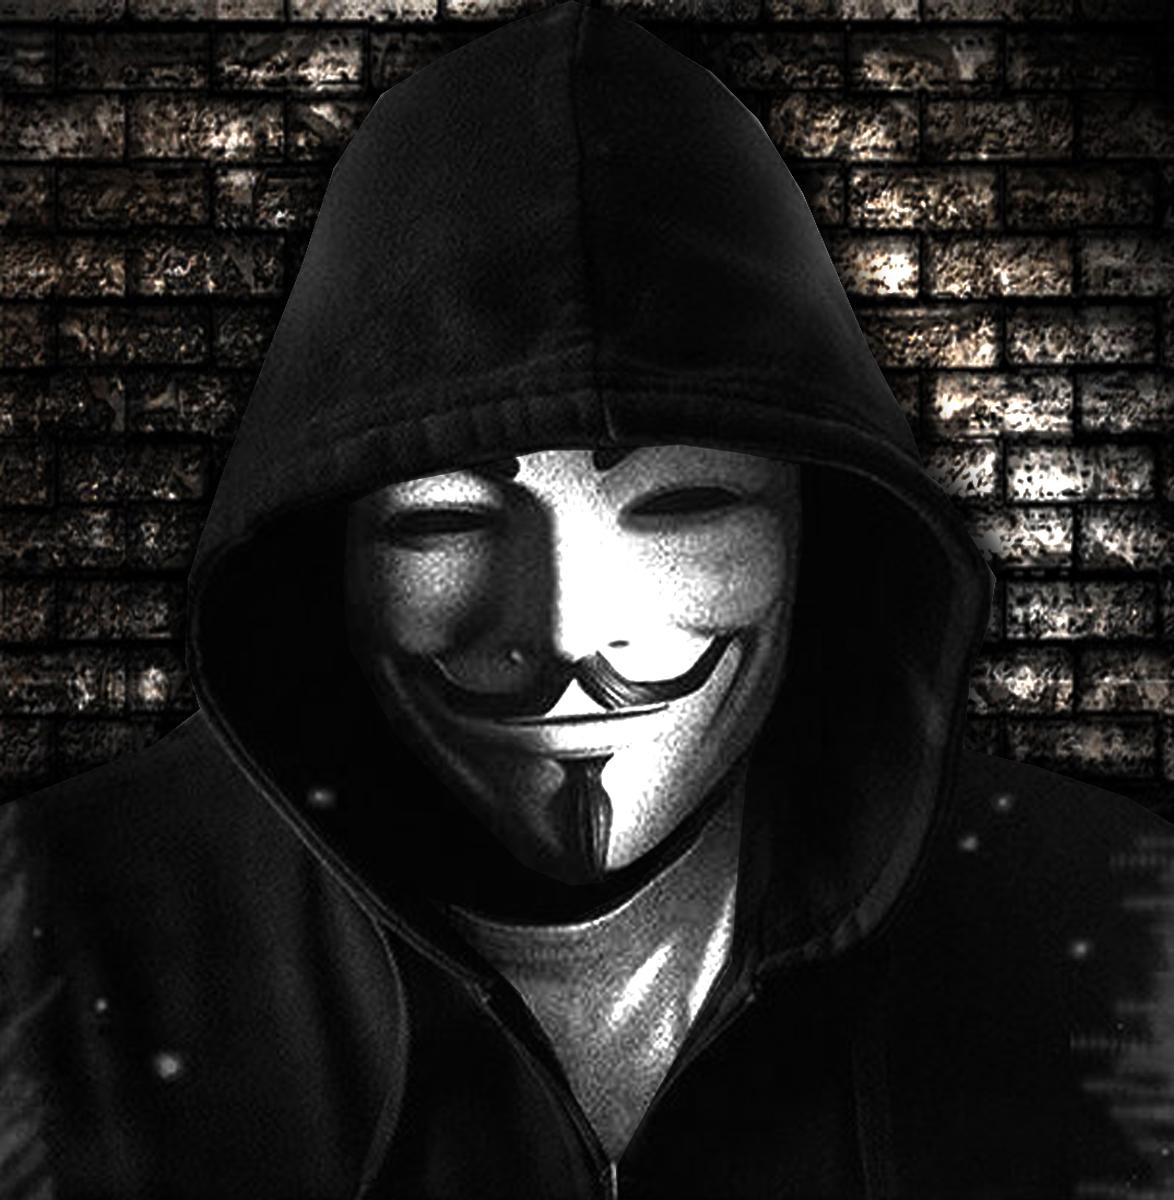 Anonymous Photo by TheDamDamBW12 on DeviantArt